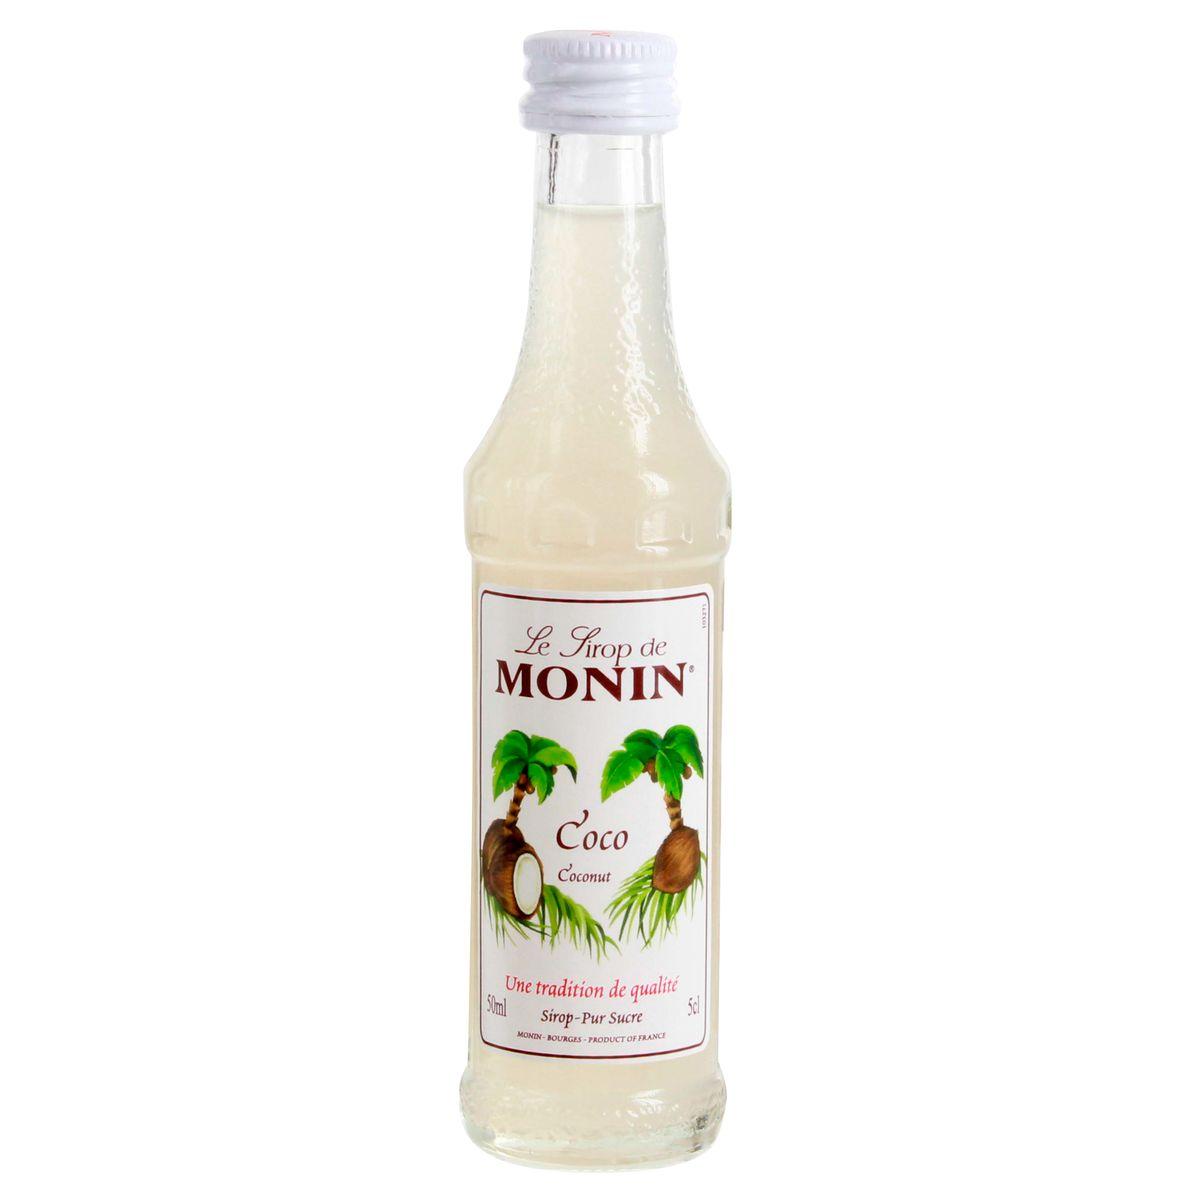 Mignonette sirop - coco - Monin